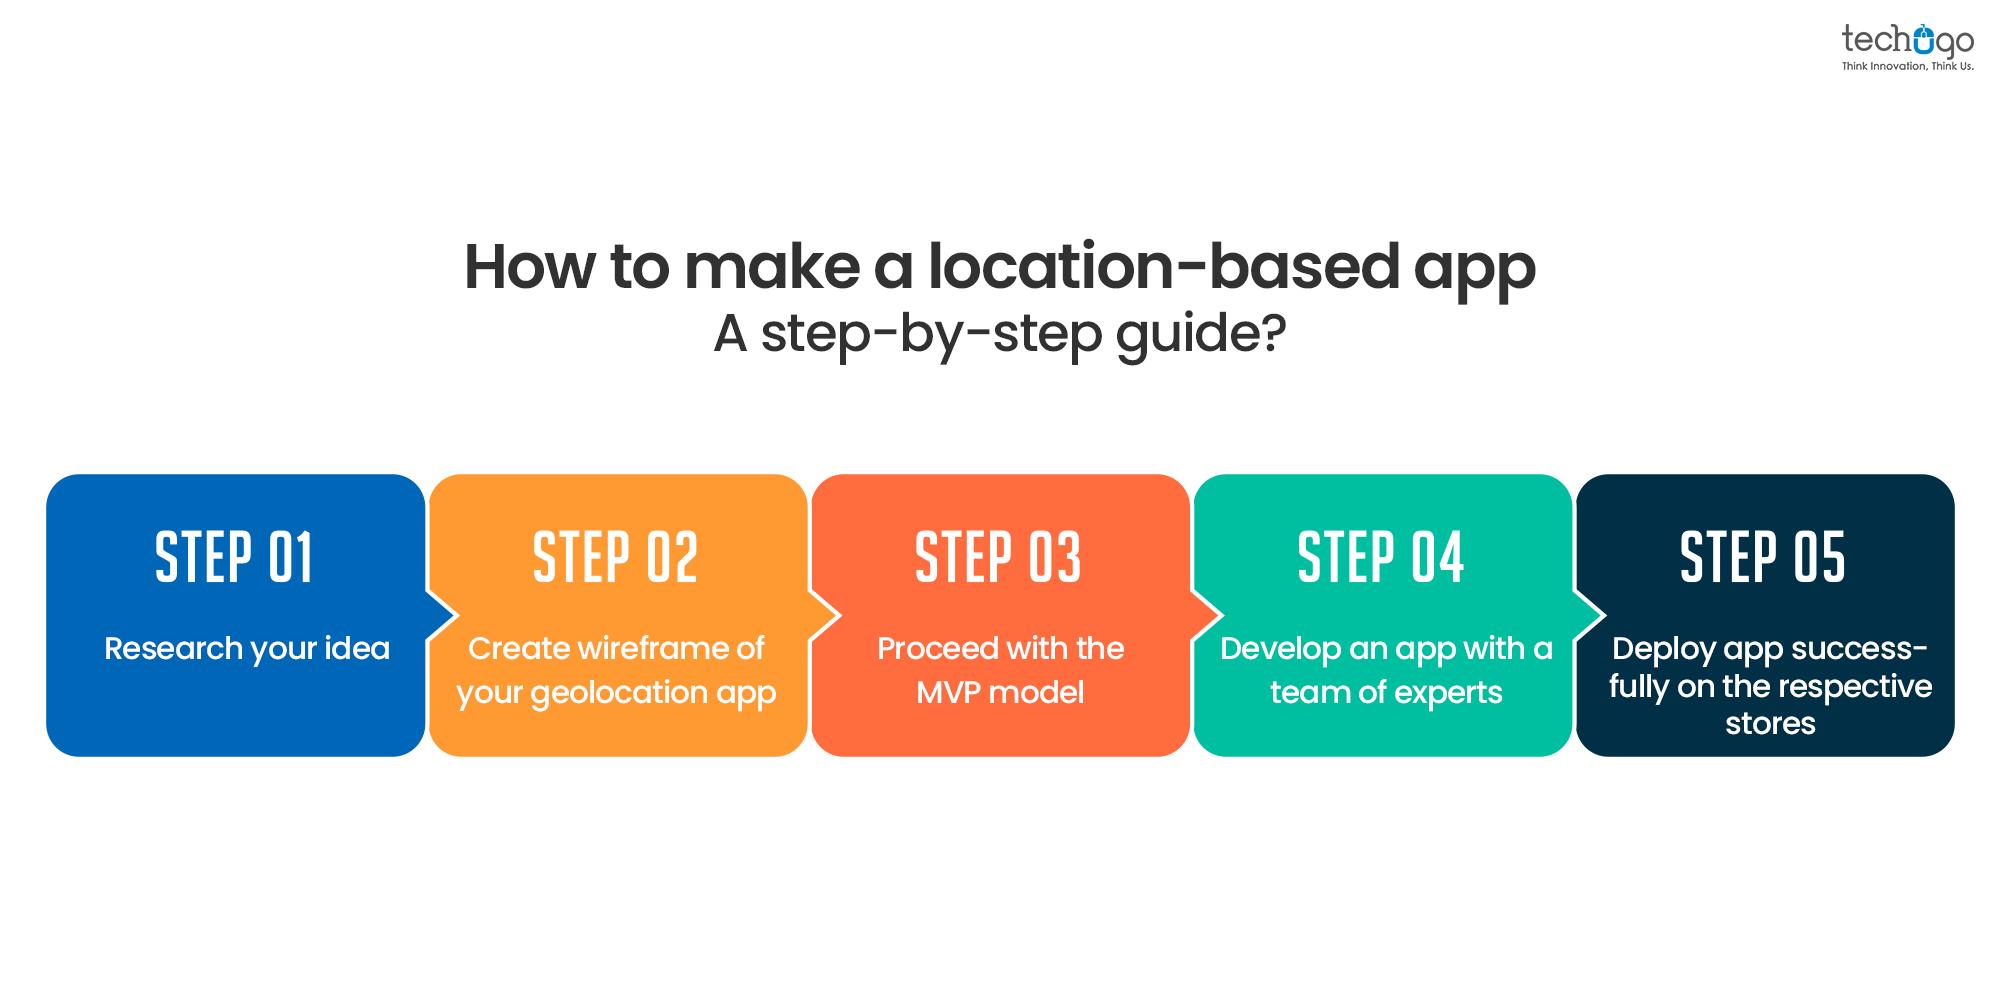 location-based app